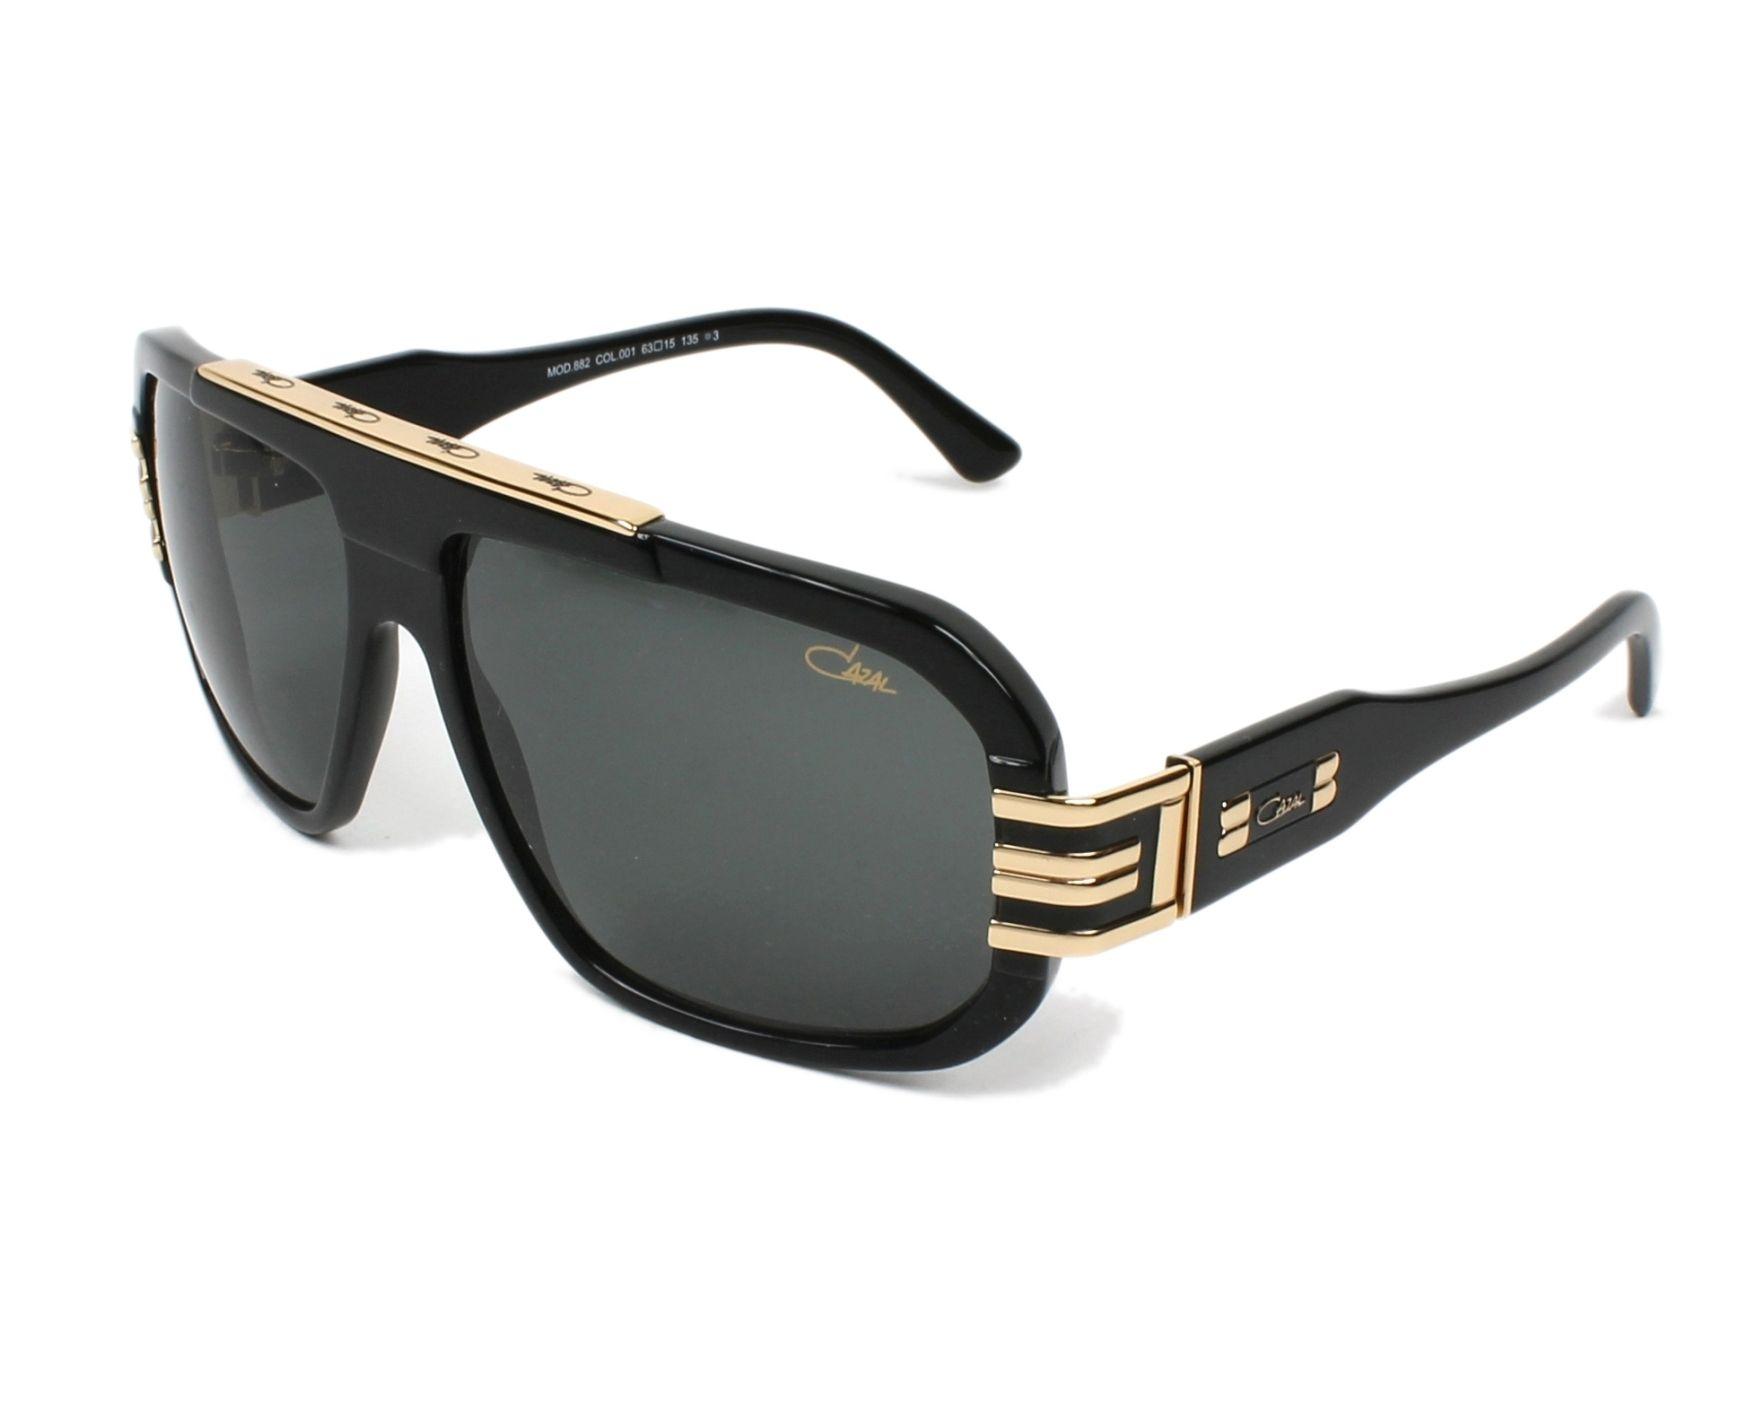 cazal sunglasses 882 001 black visionet. Black Bedroom Furniture Sets. Home Design Ideas